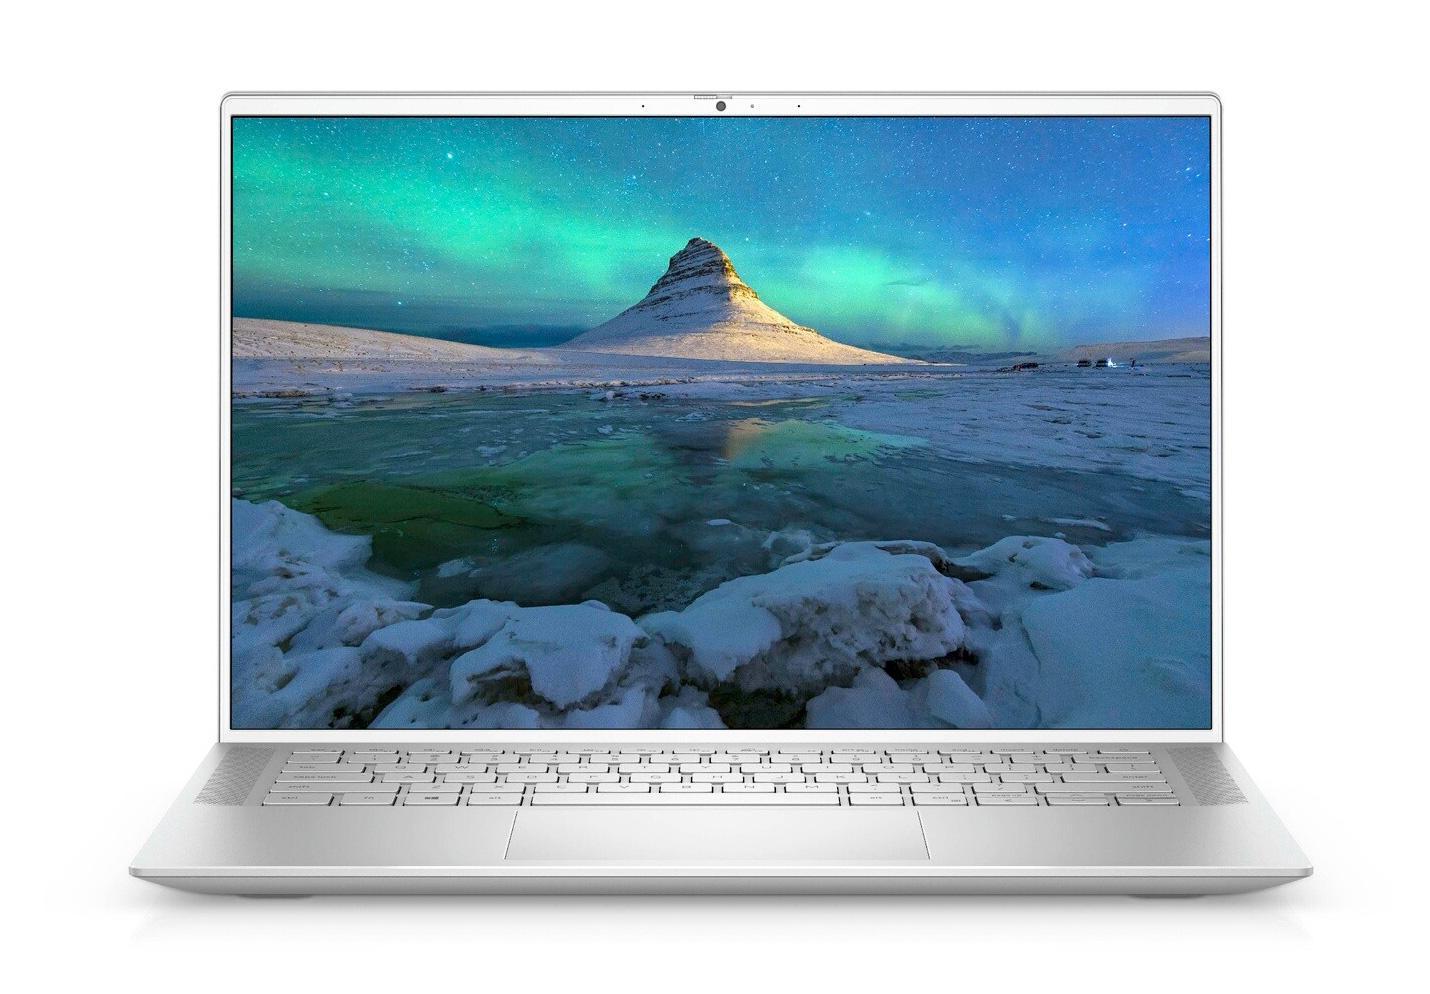 Ordinateur portable Dell Inspiron 14 7400 Argent - QHD+, MX350, Core i7  - photo 2